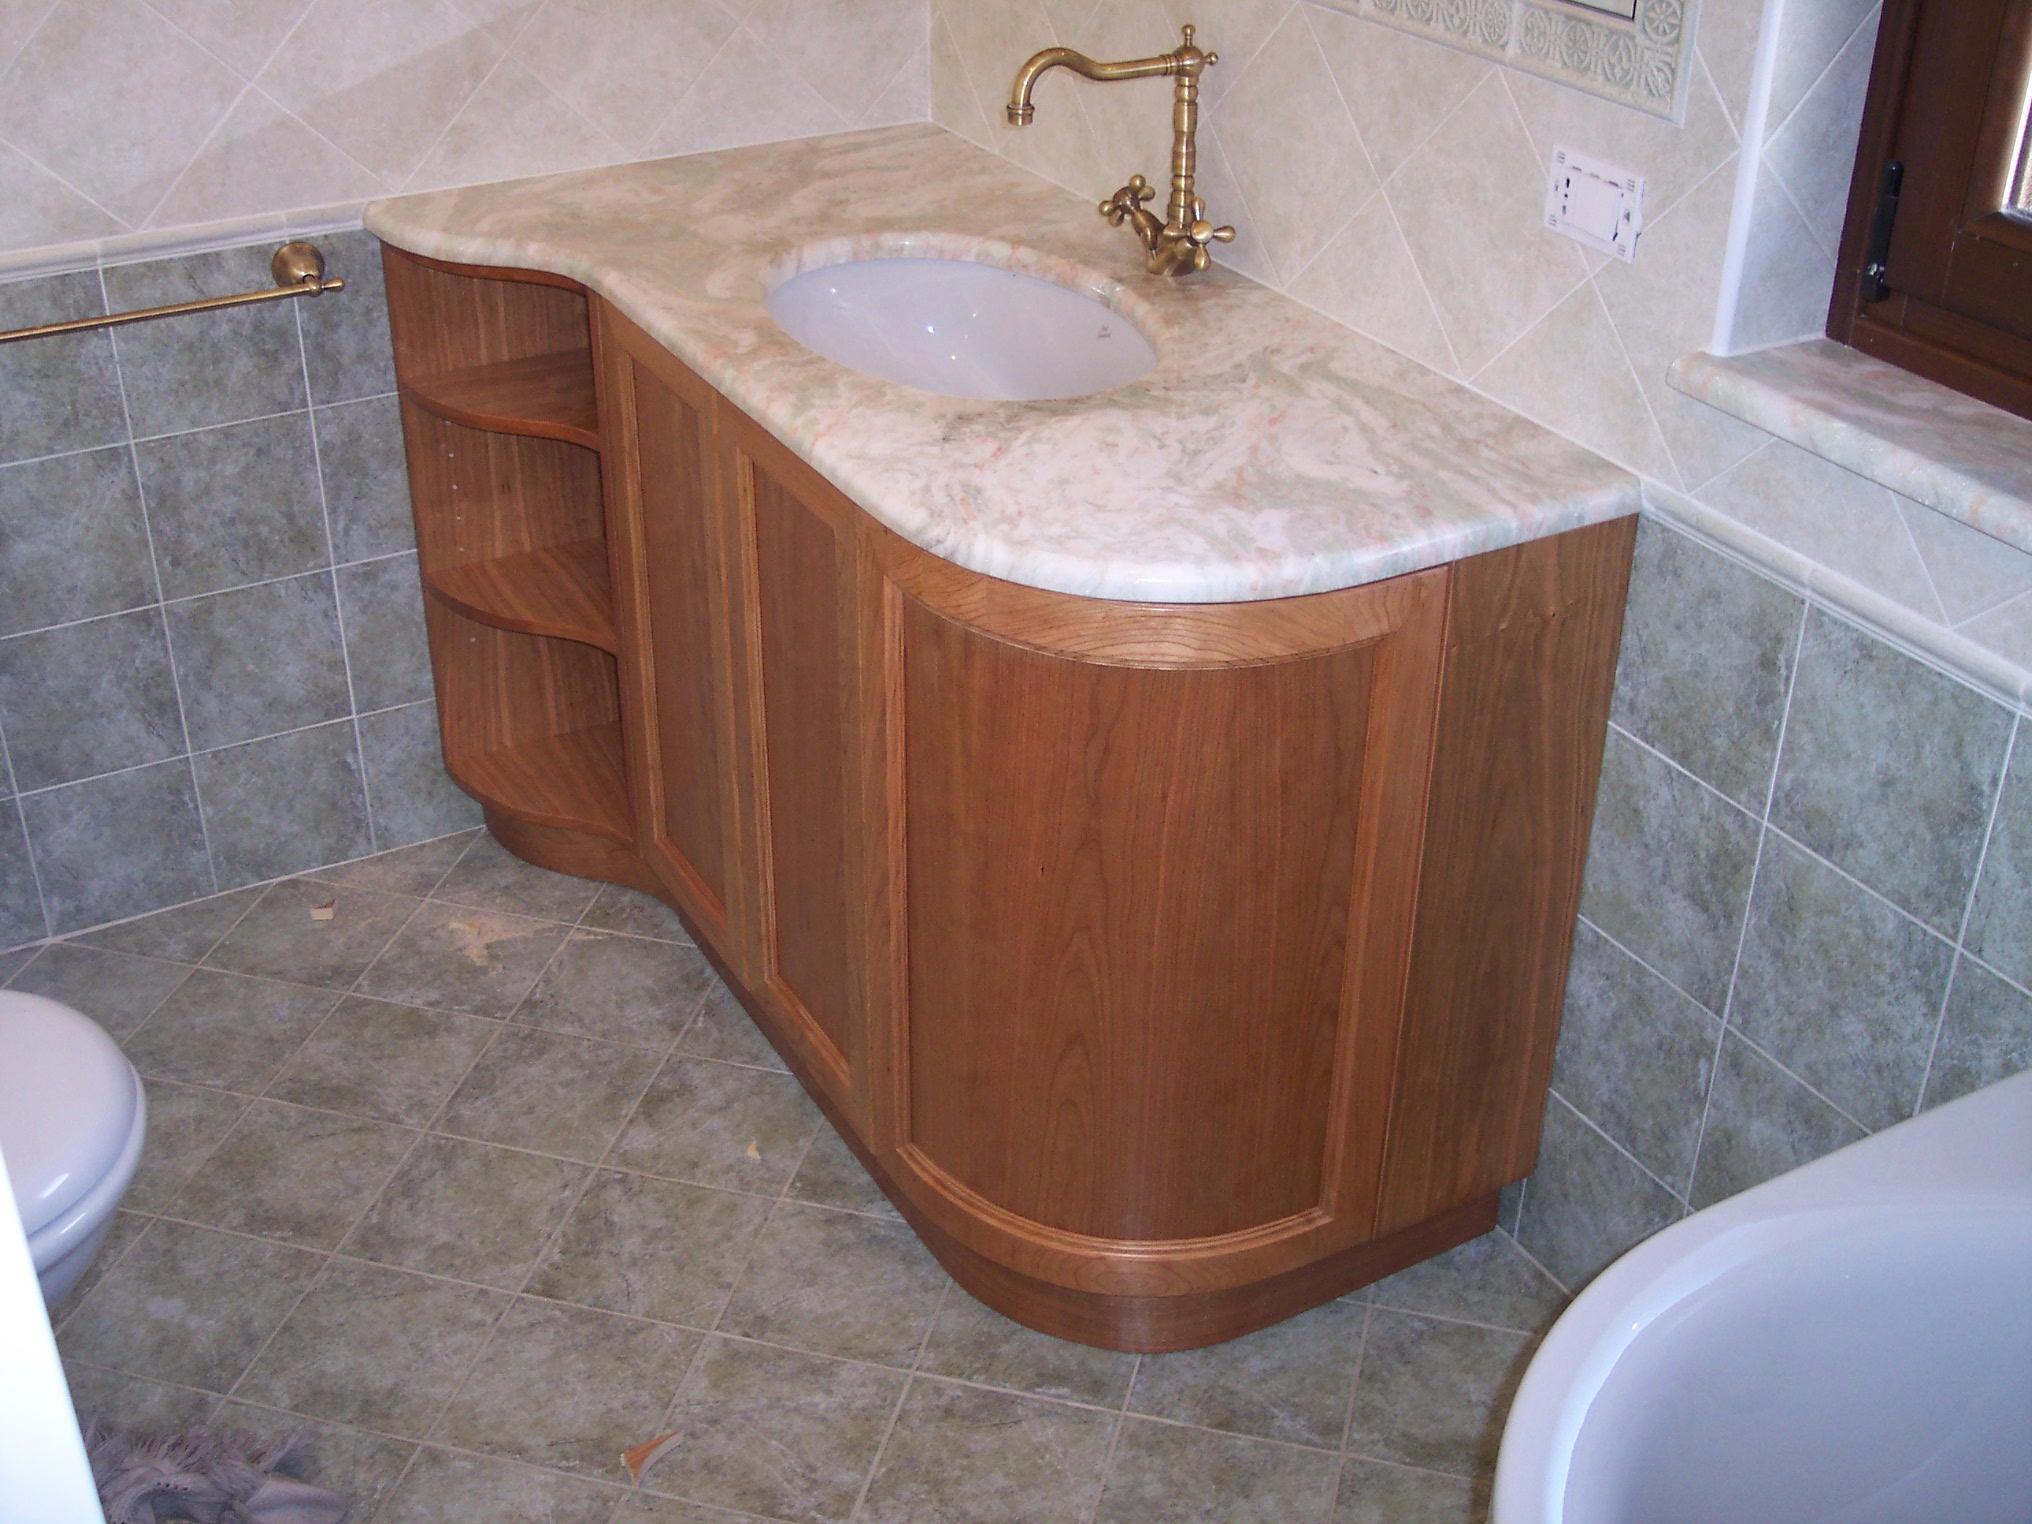 Falegnameria silvestre i bagni for Mobile bagno usato